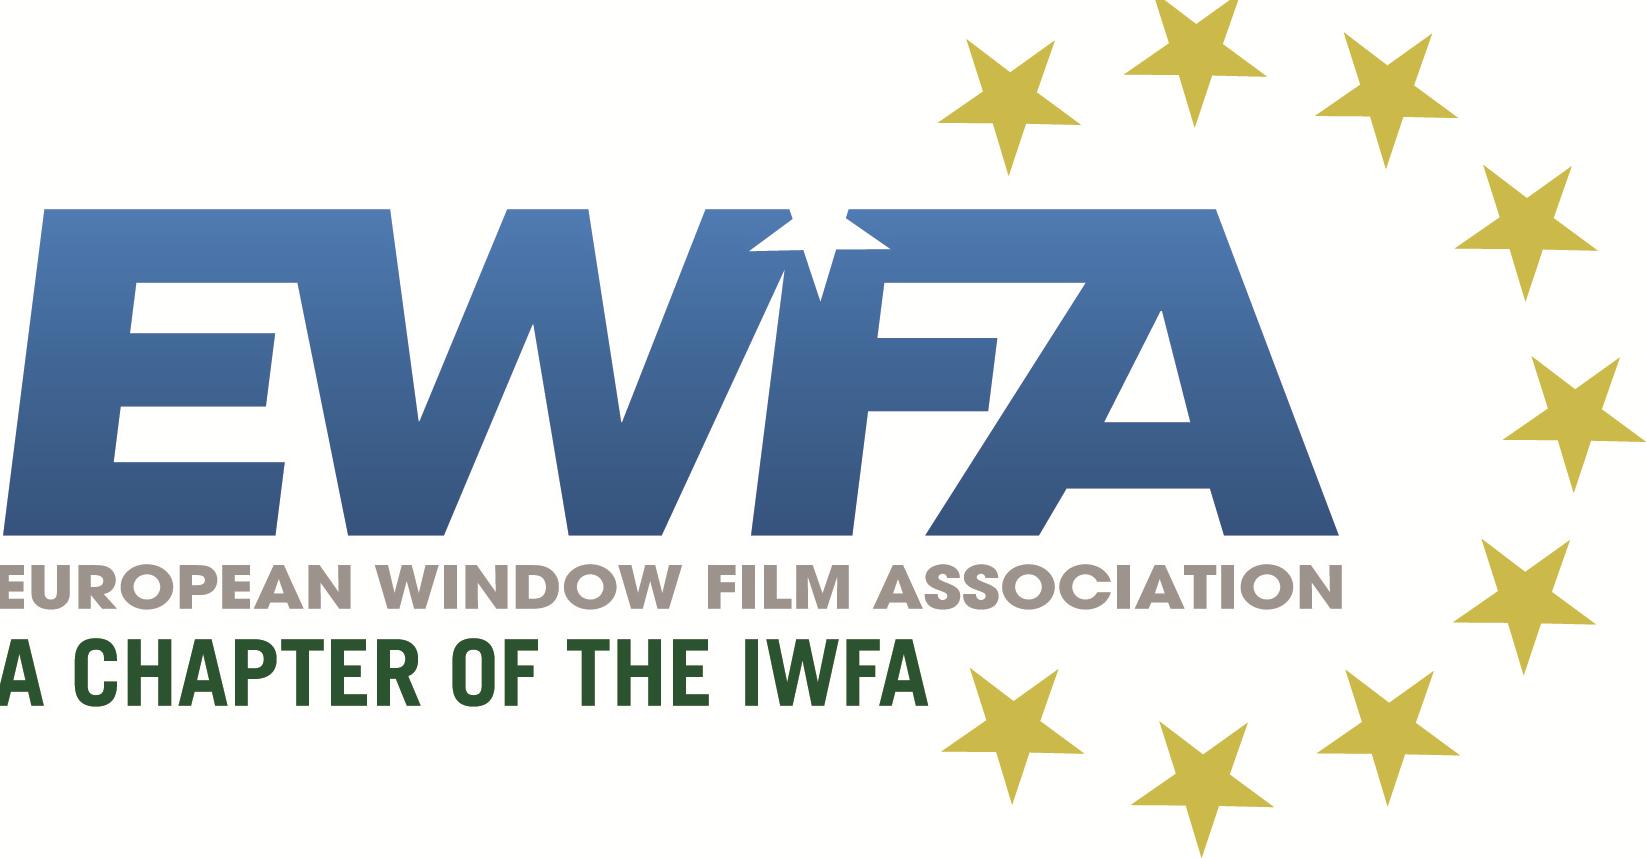 EWFA Webinar on Energy Efficiency of Window Films